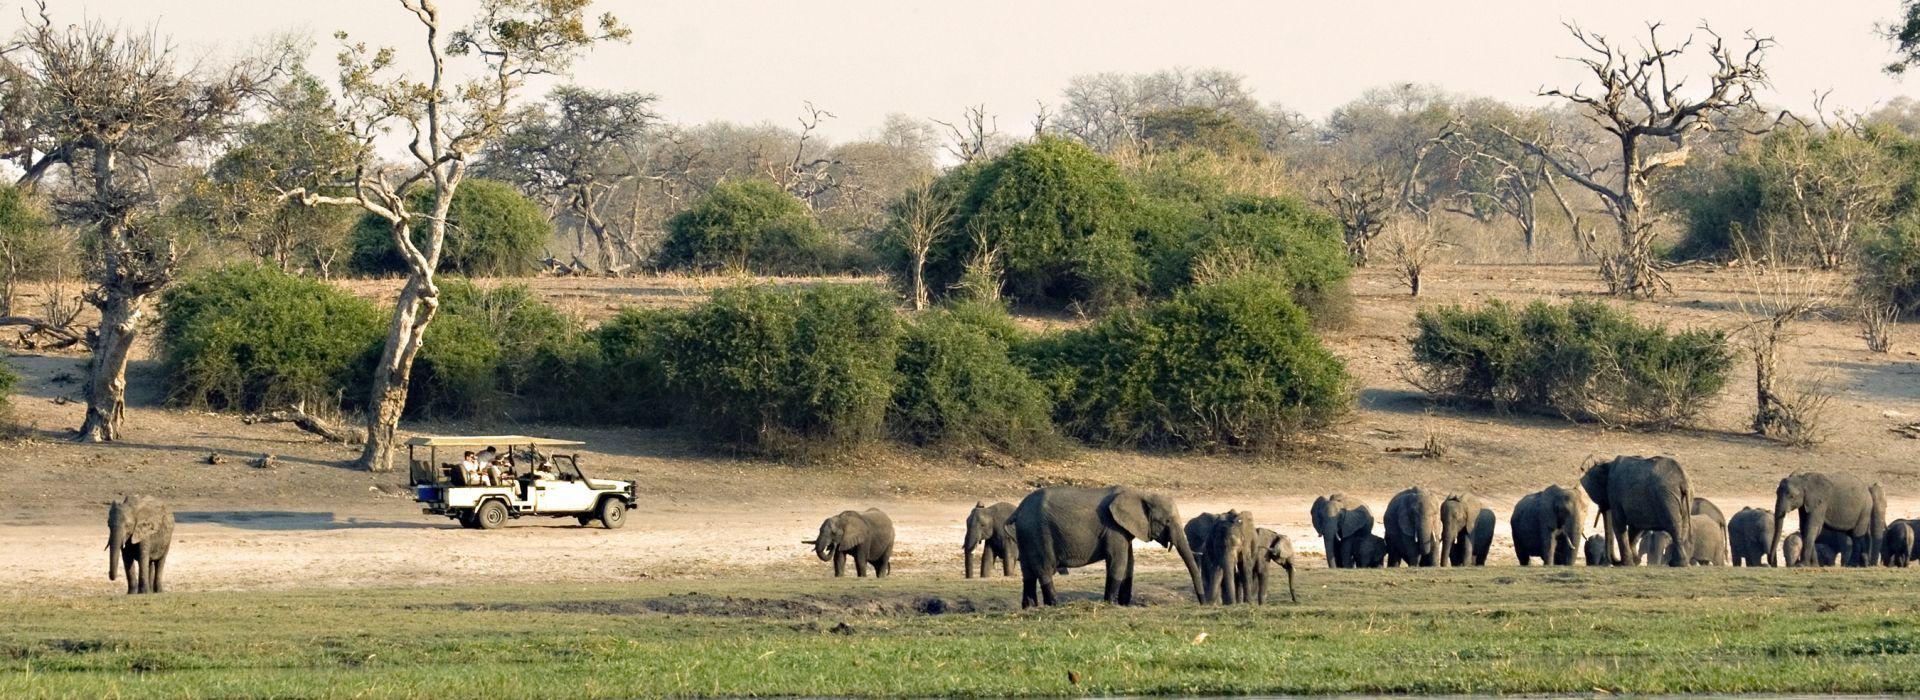 Boat tours, water sports and marine wildlife in Botswana